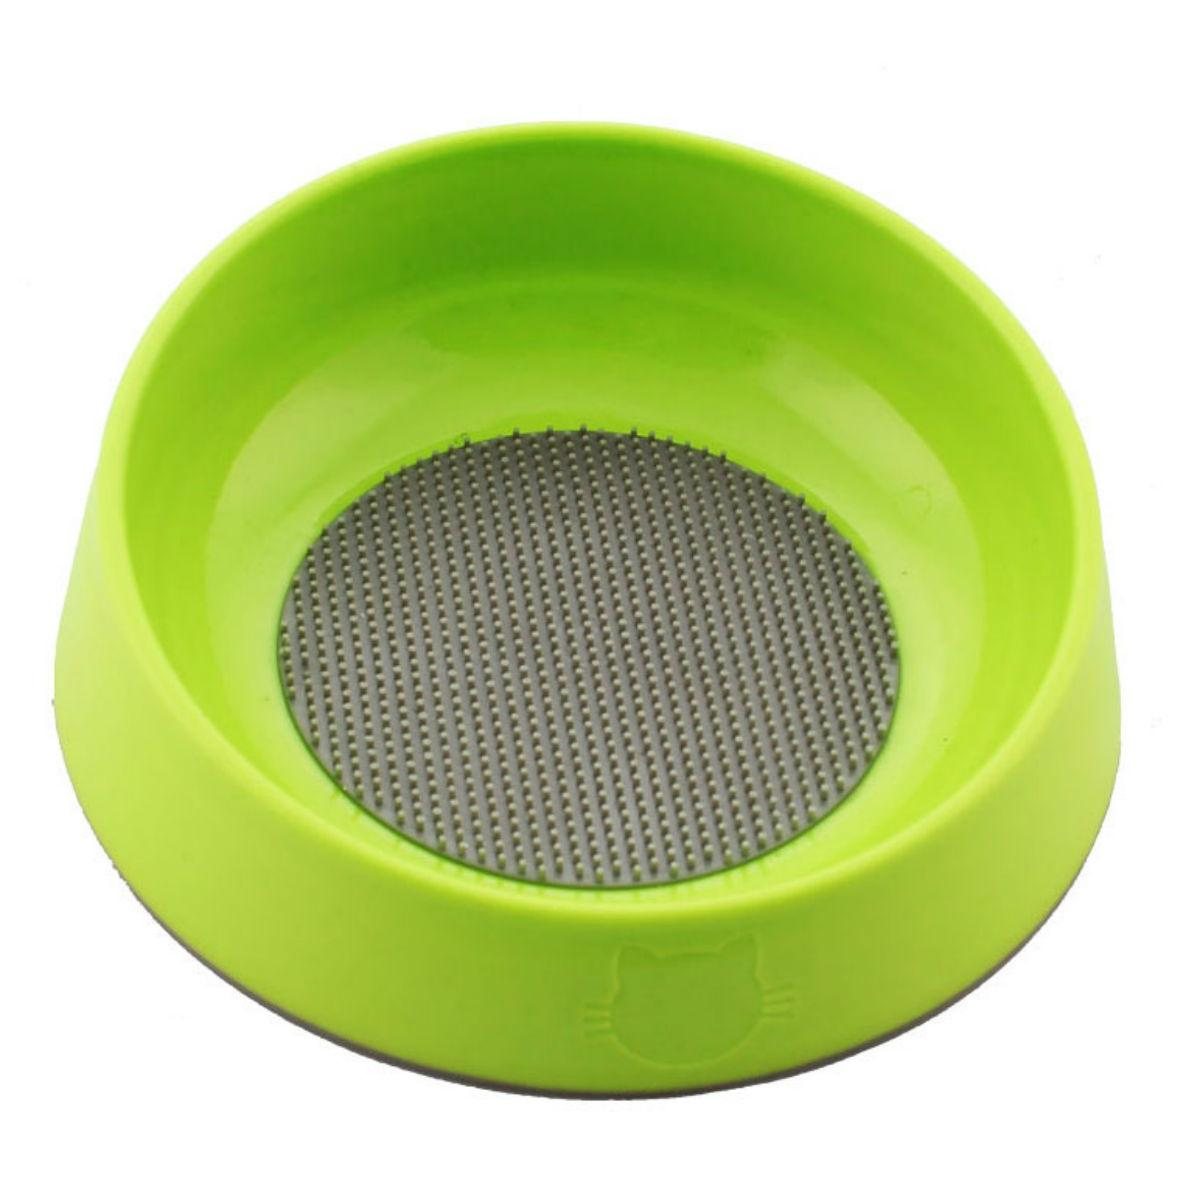 Hyper Pet Oral Health Cat Bowl - Green